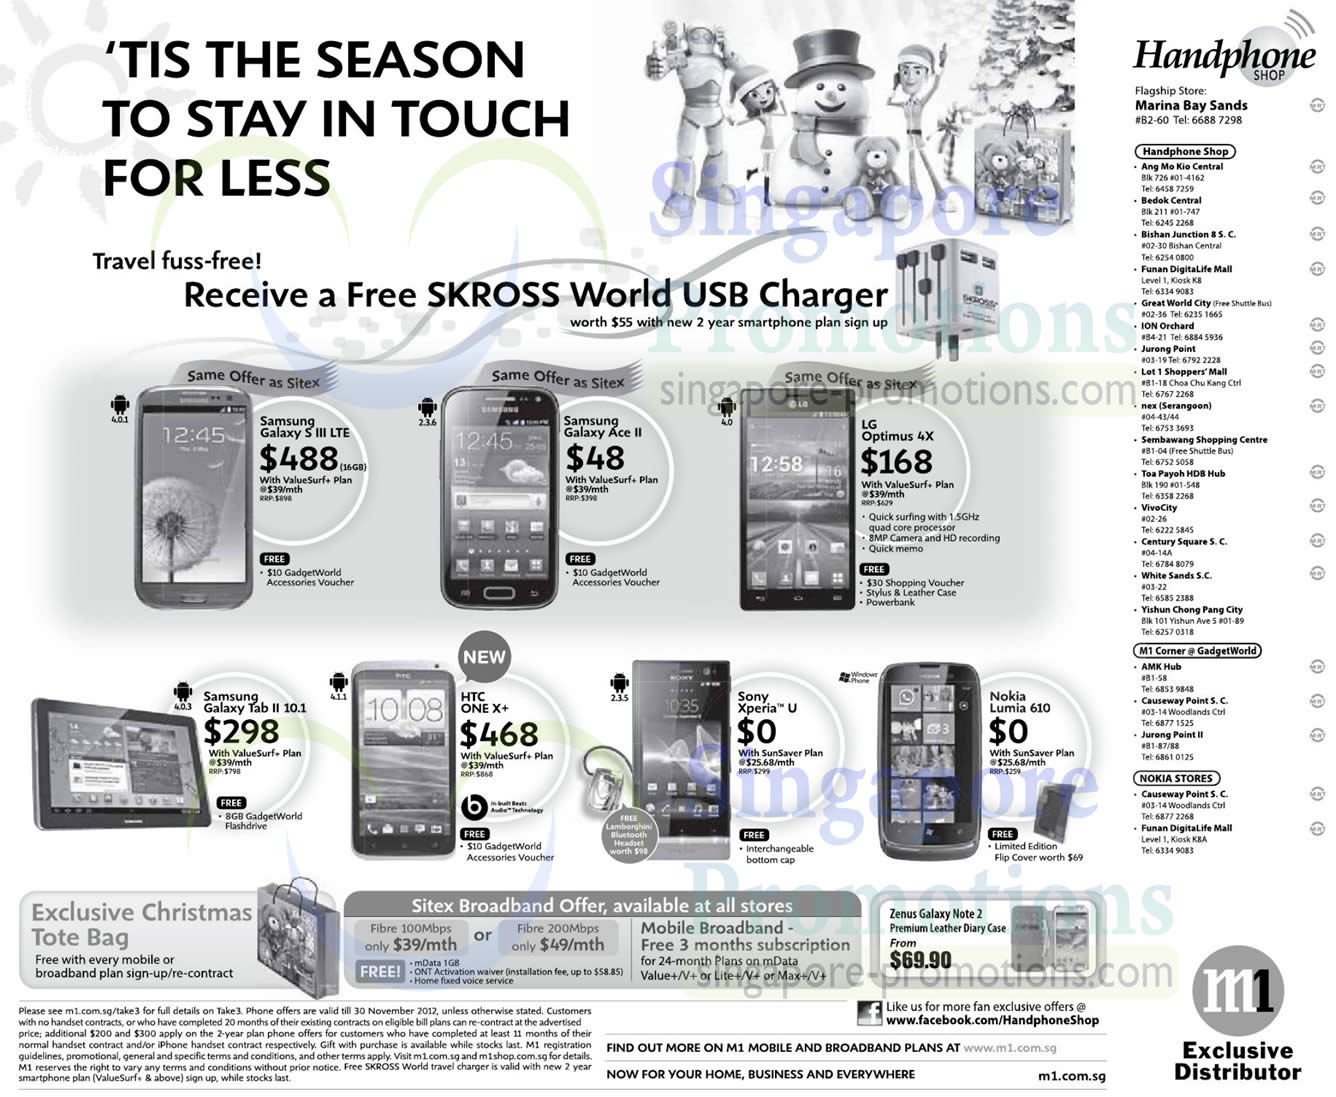 25 Nov Handphone Shop Samsung Galaxy S III LTE Ace 2 Tab